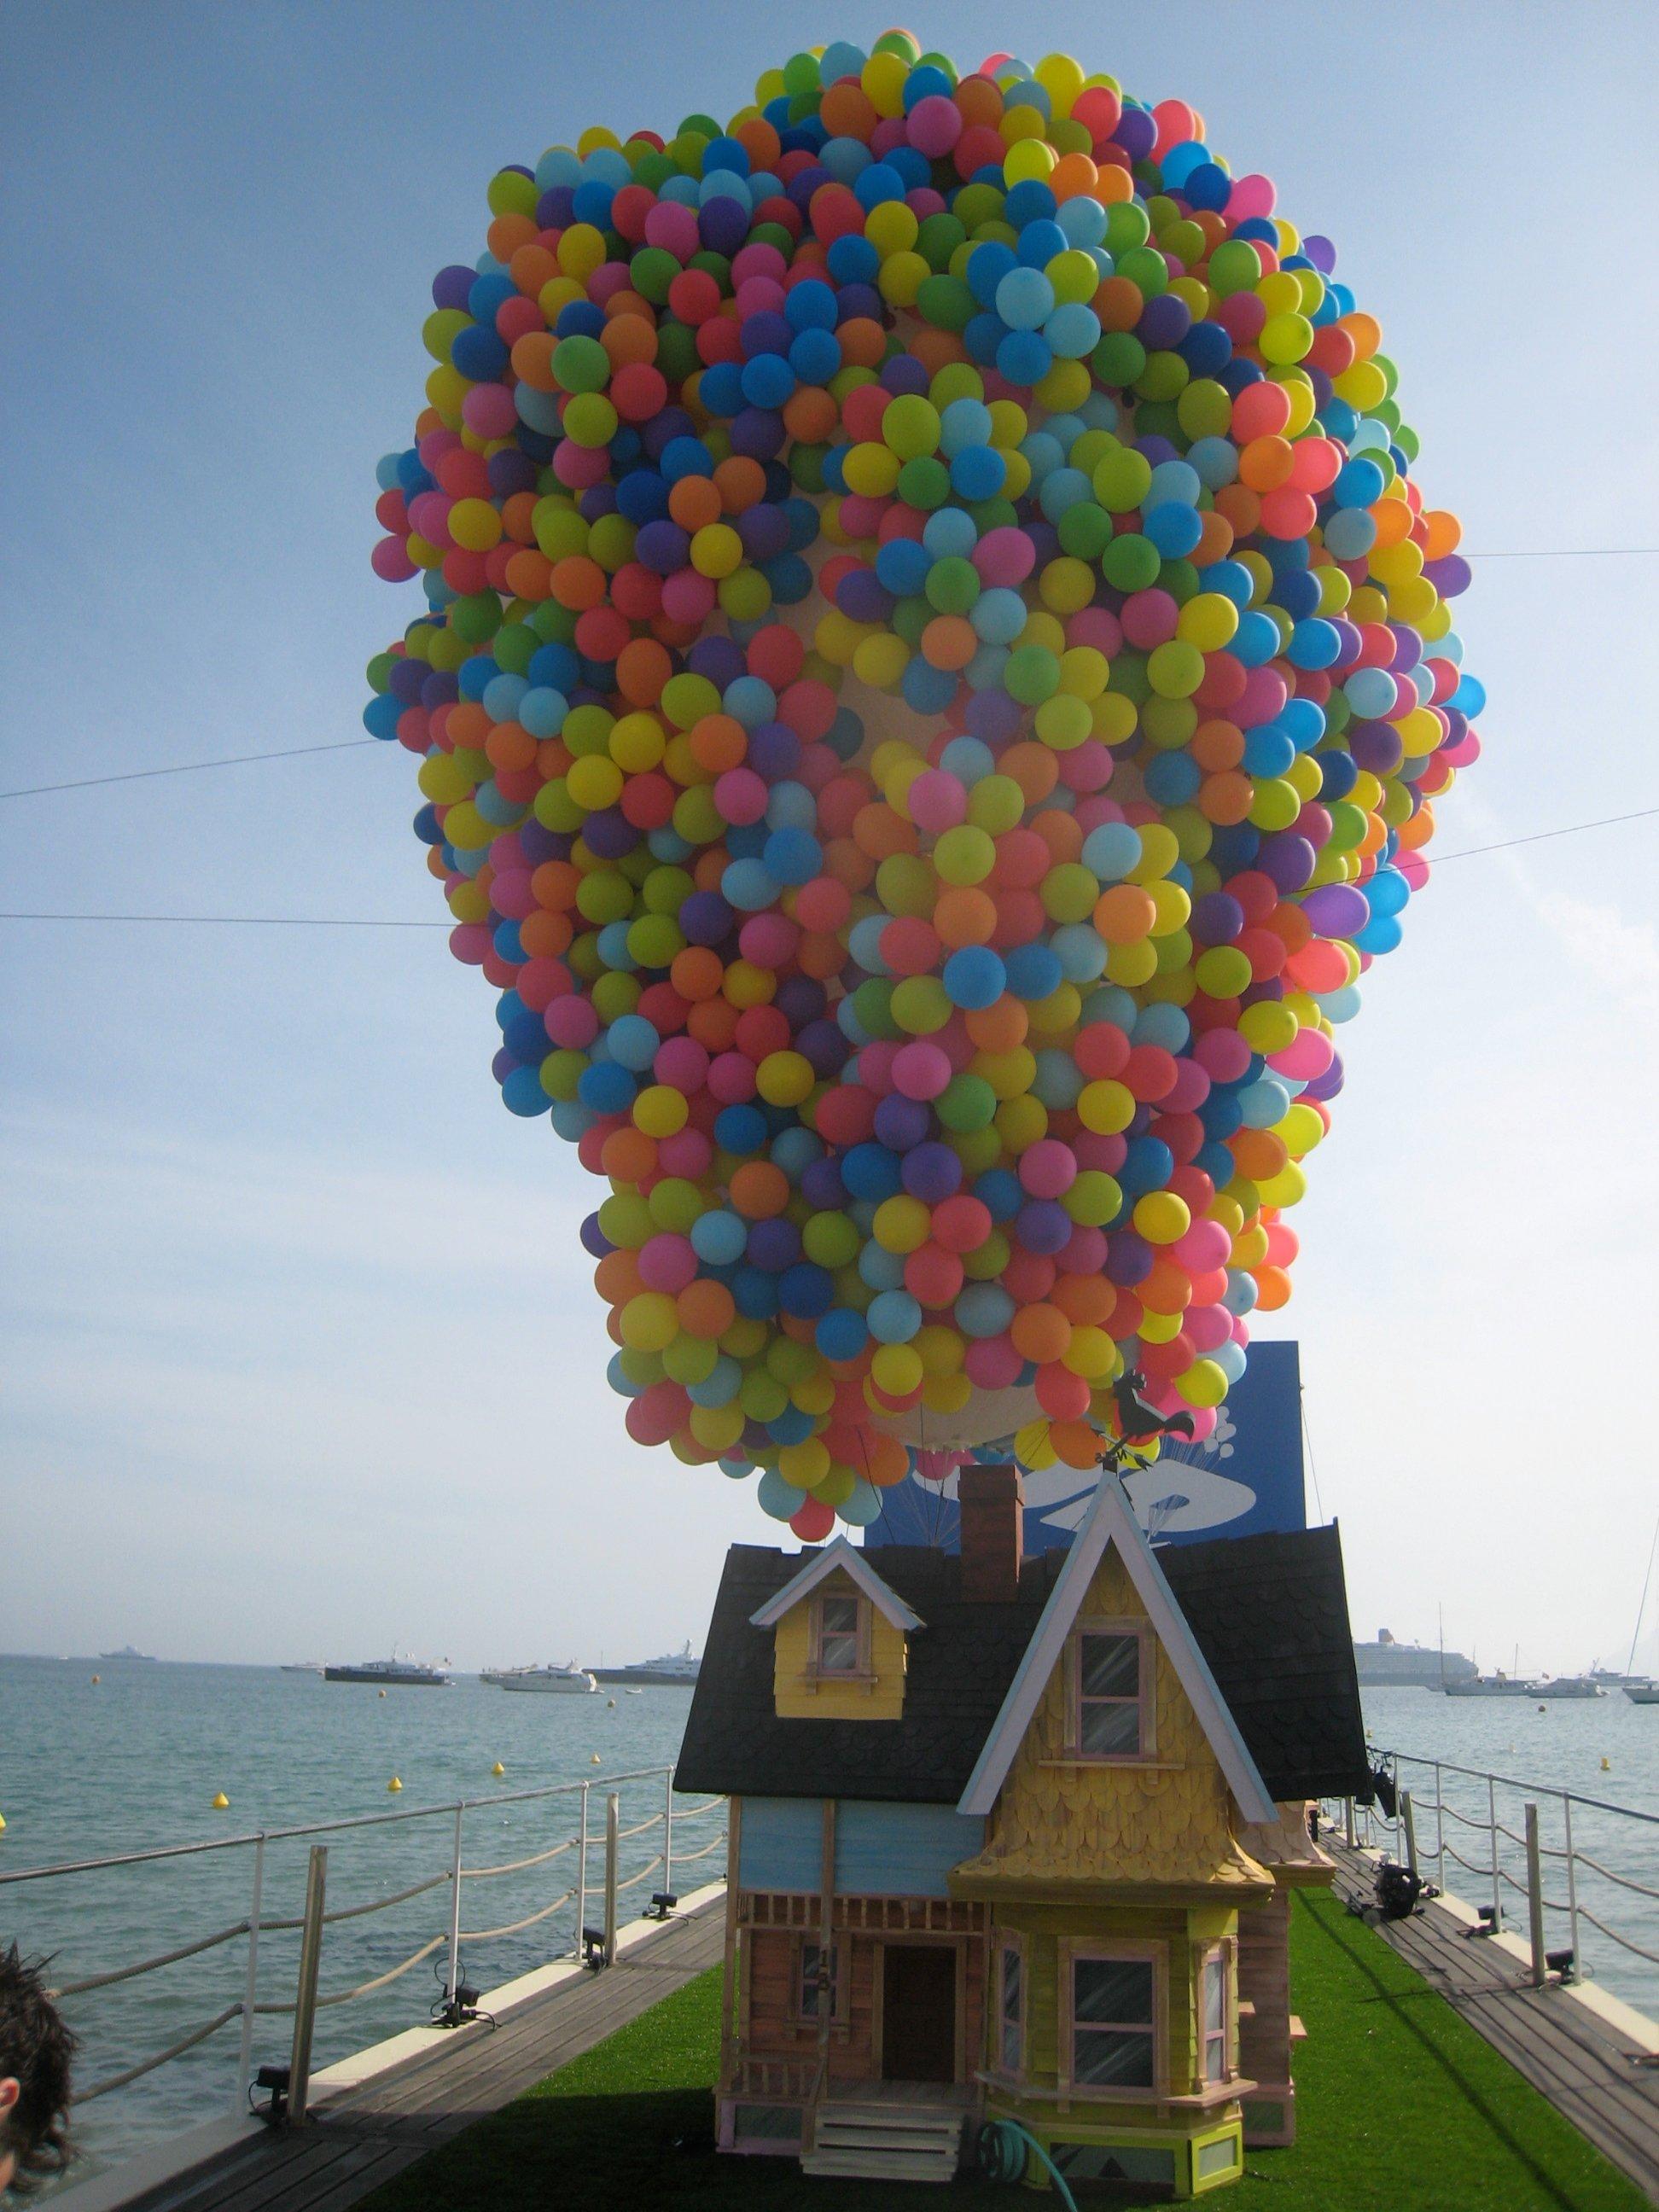 Up House Balloons Pixar | www.pixshark.com - Images ...